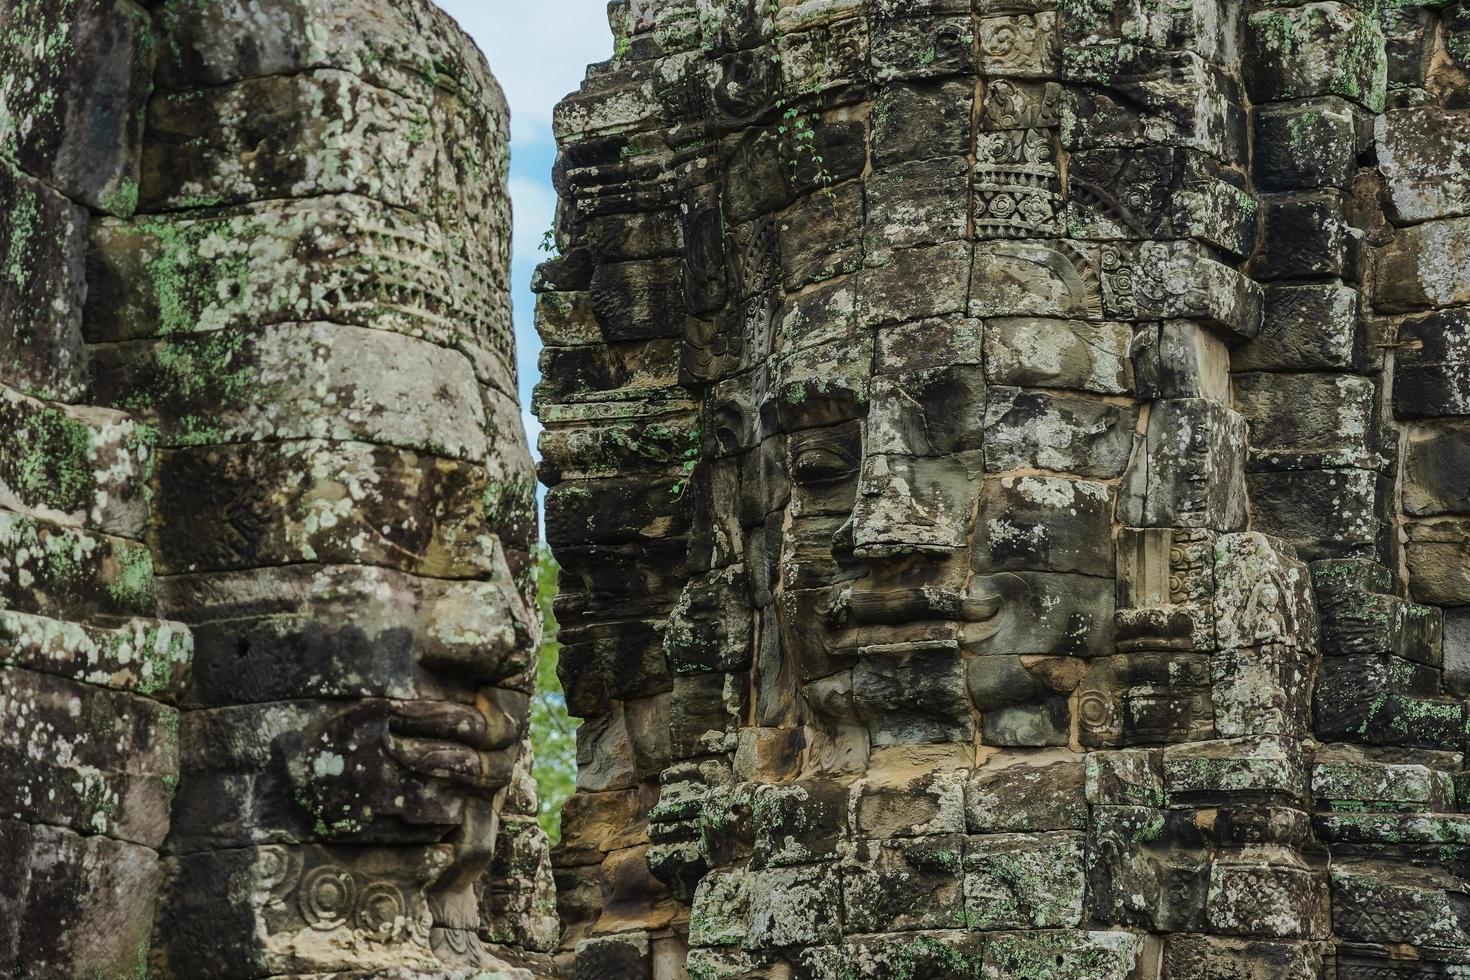 alte Steinwände des Bajon-Tempels, Angkor Wat, Siam Reap, Kambodscha foto